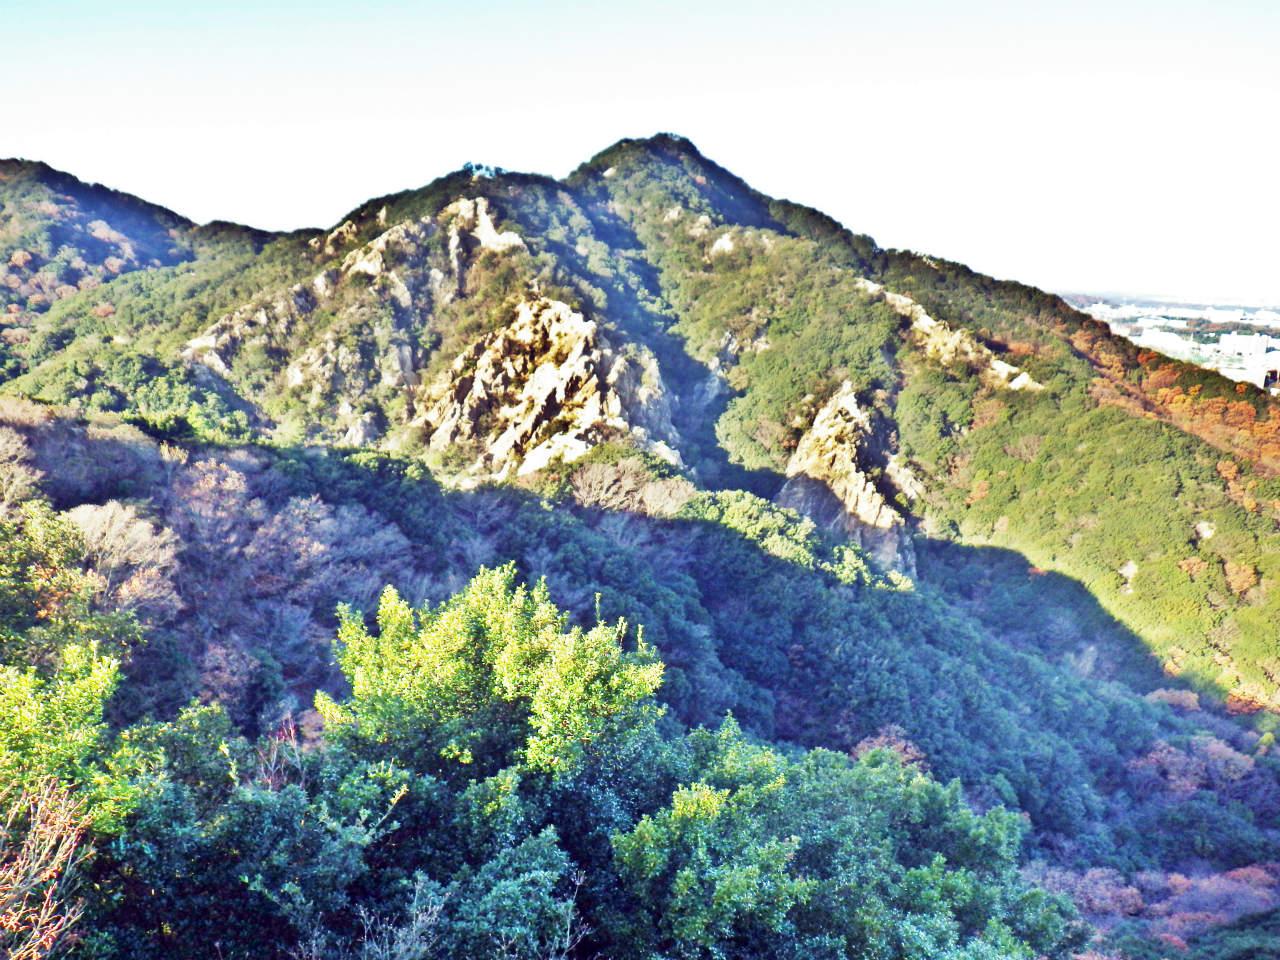 07a 東山から須磨アルプスの眺め